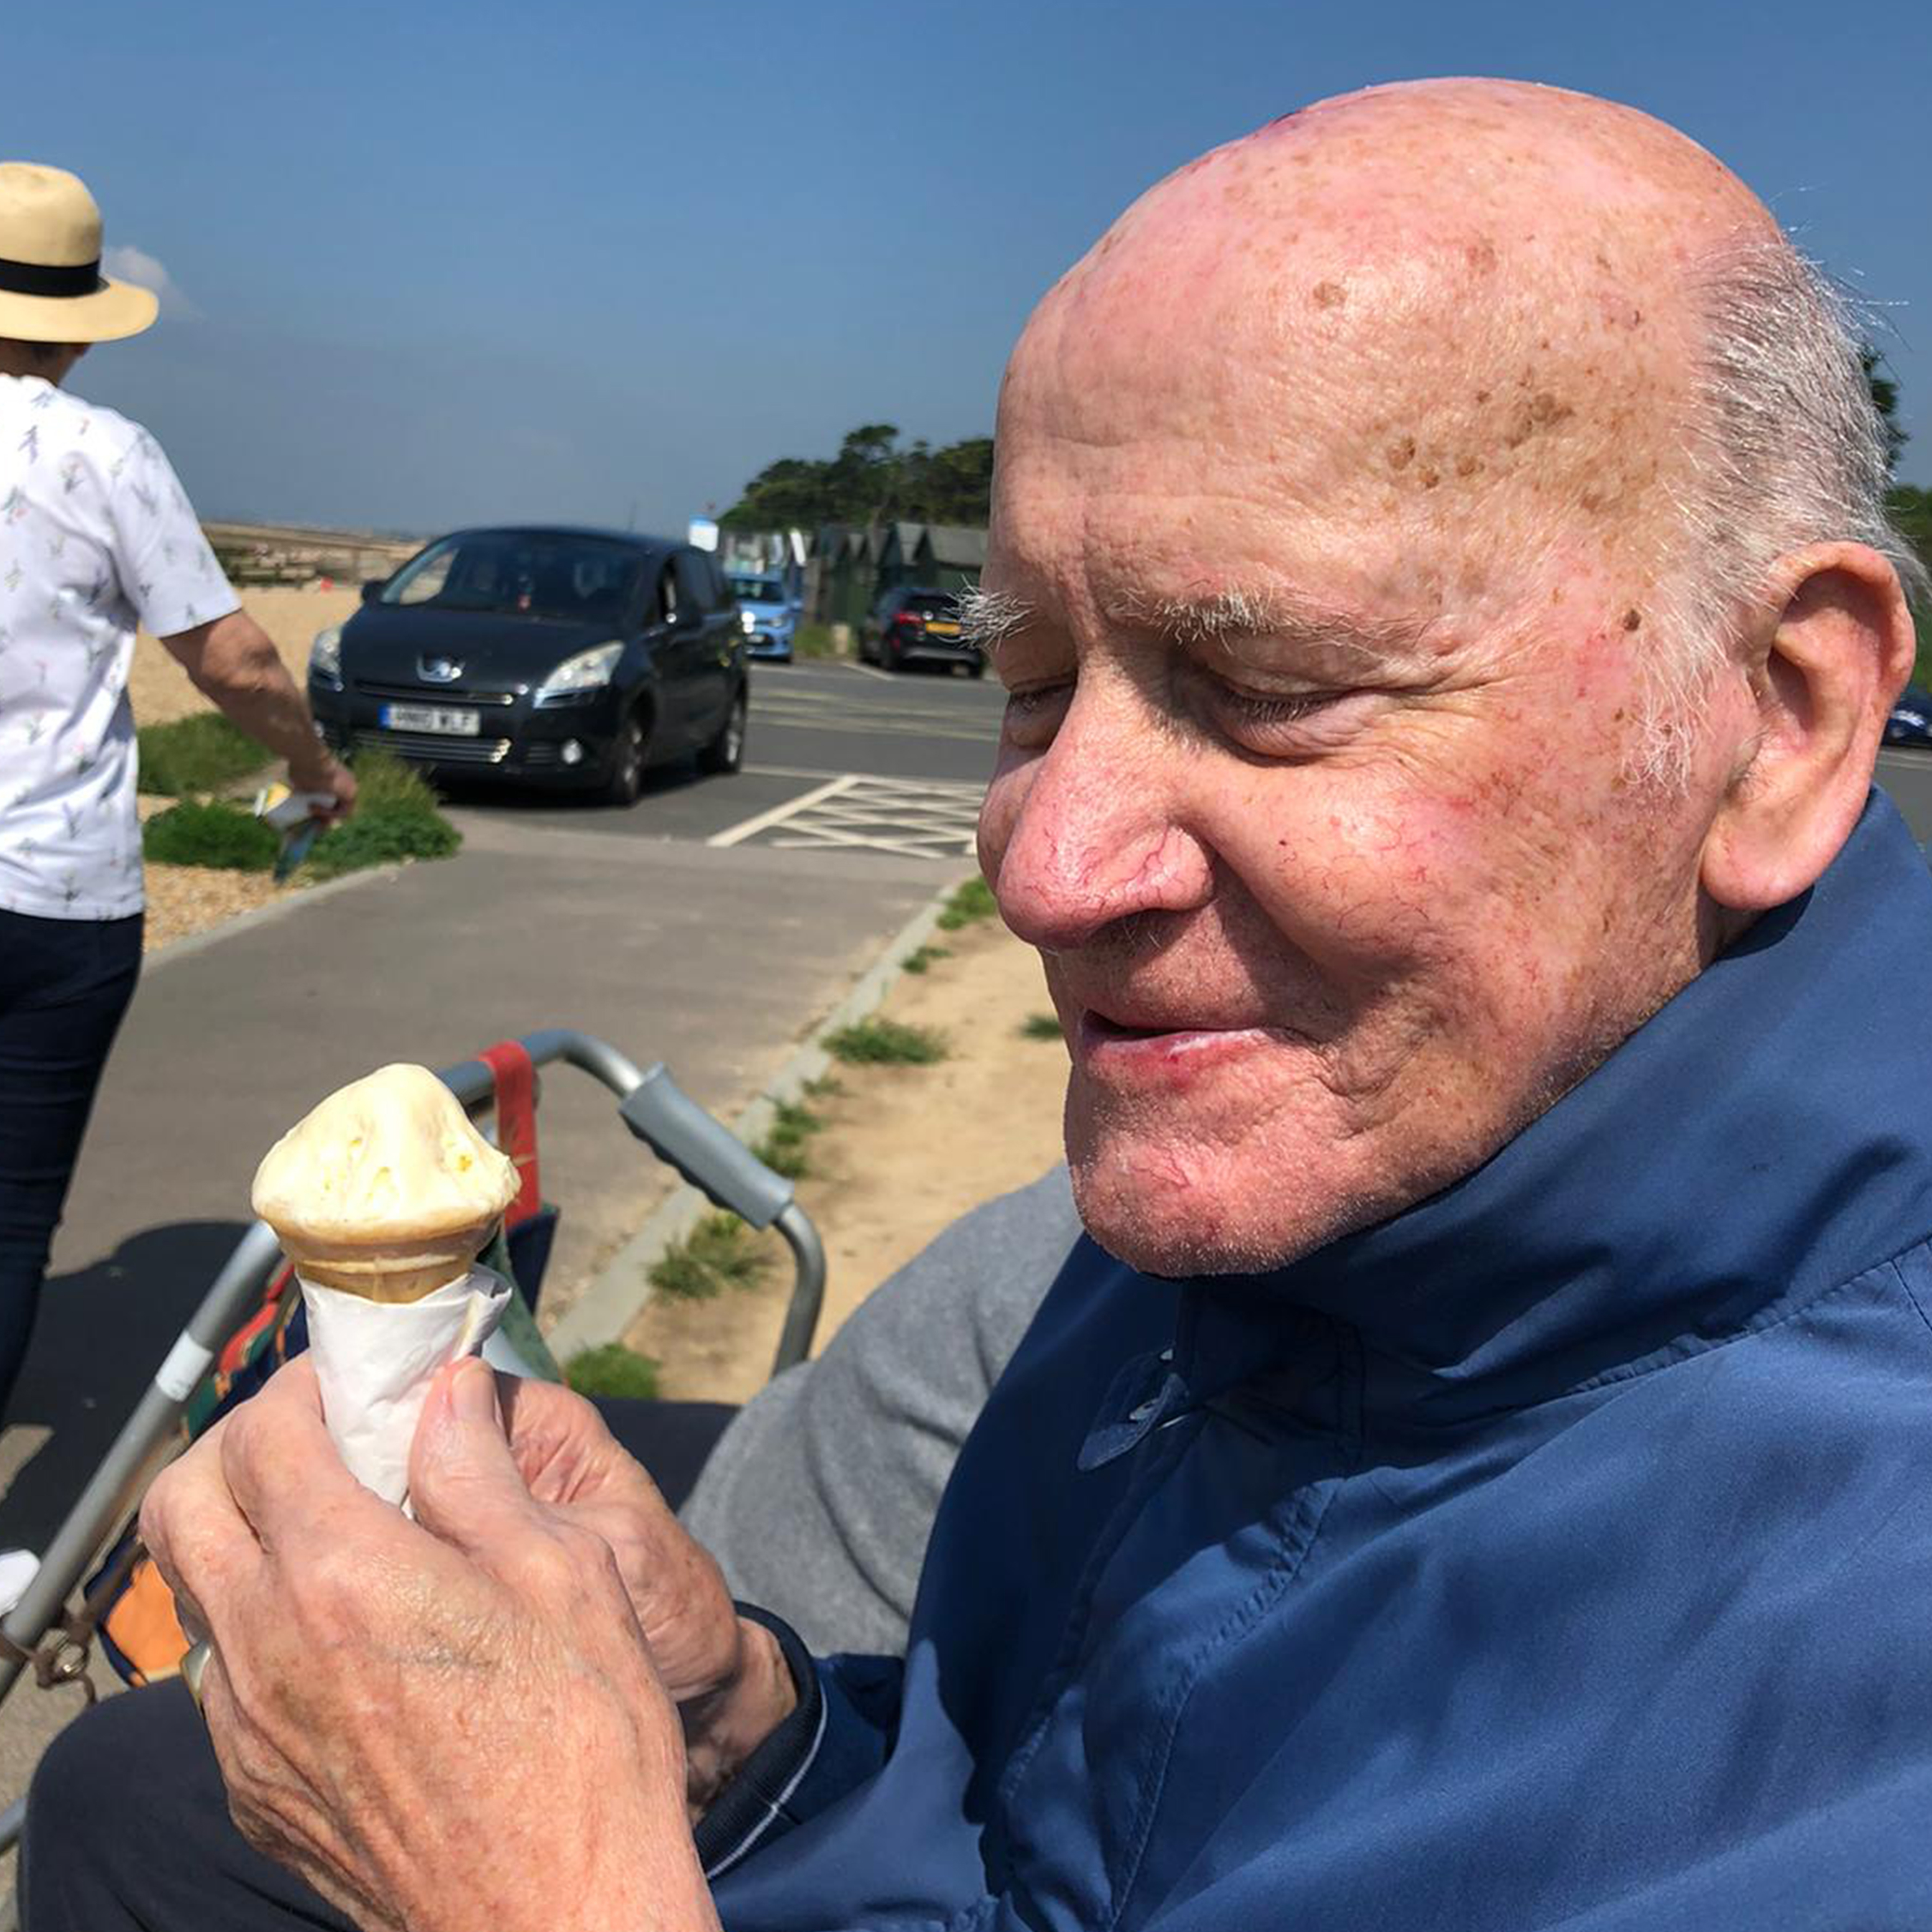 An ice cream in the sun